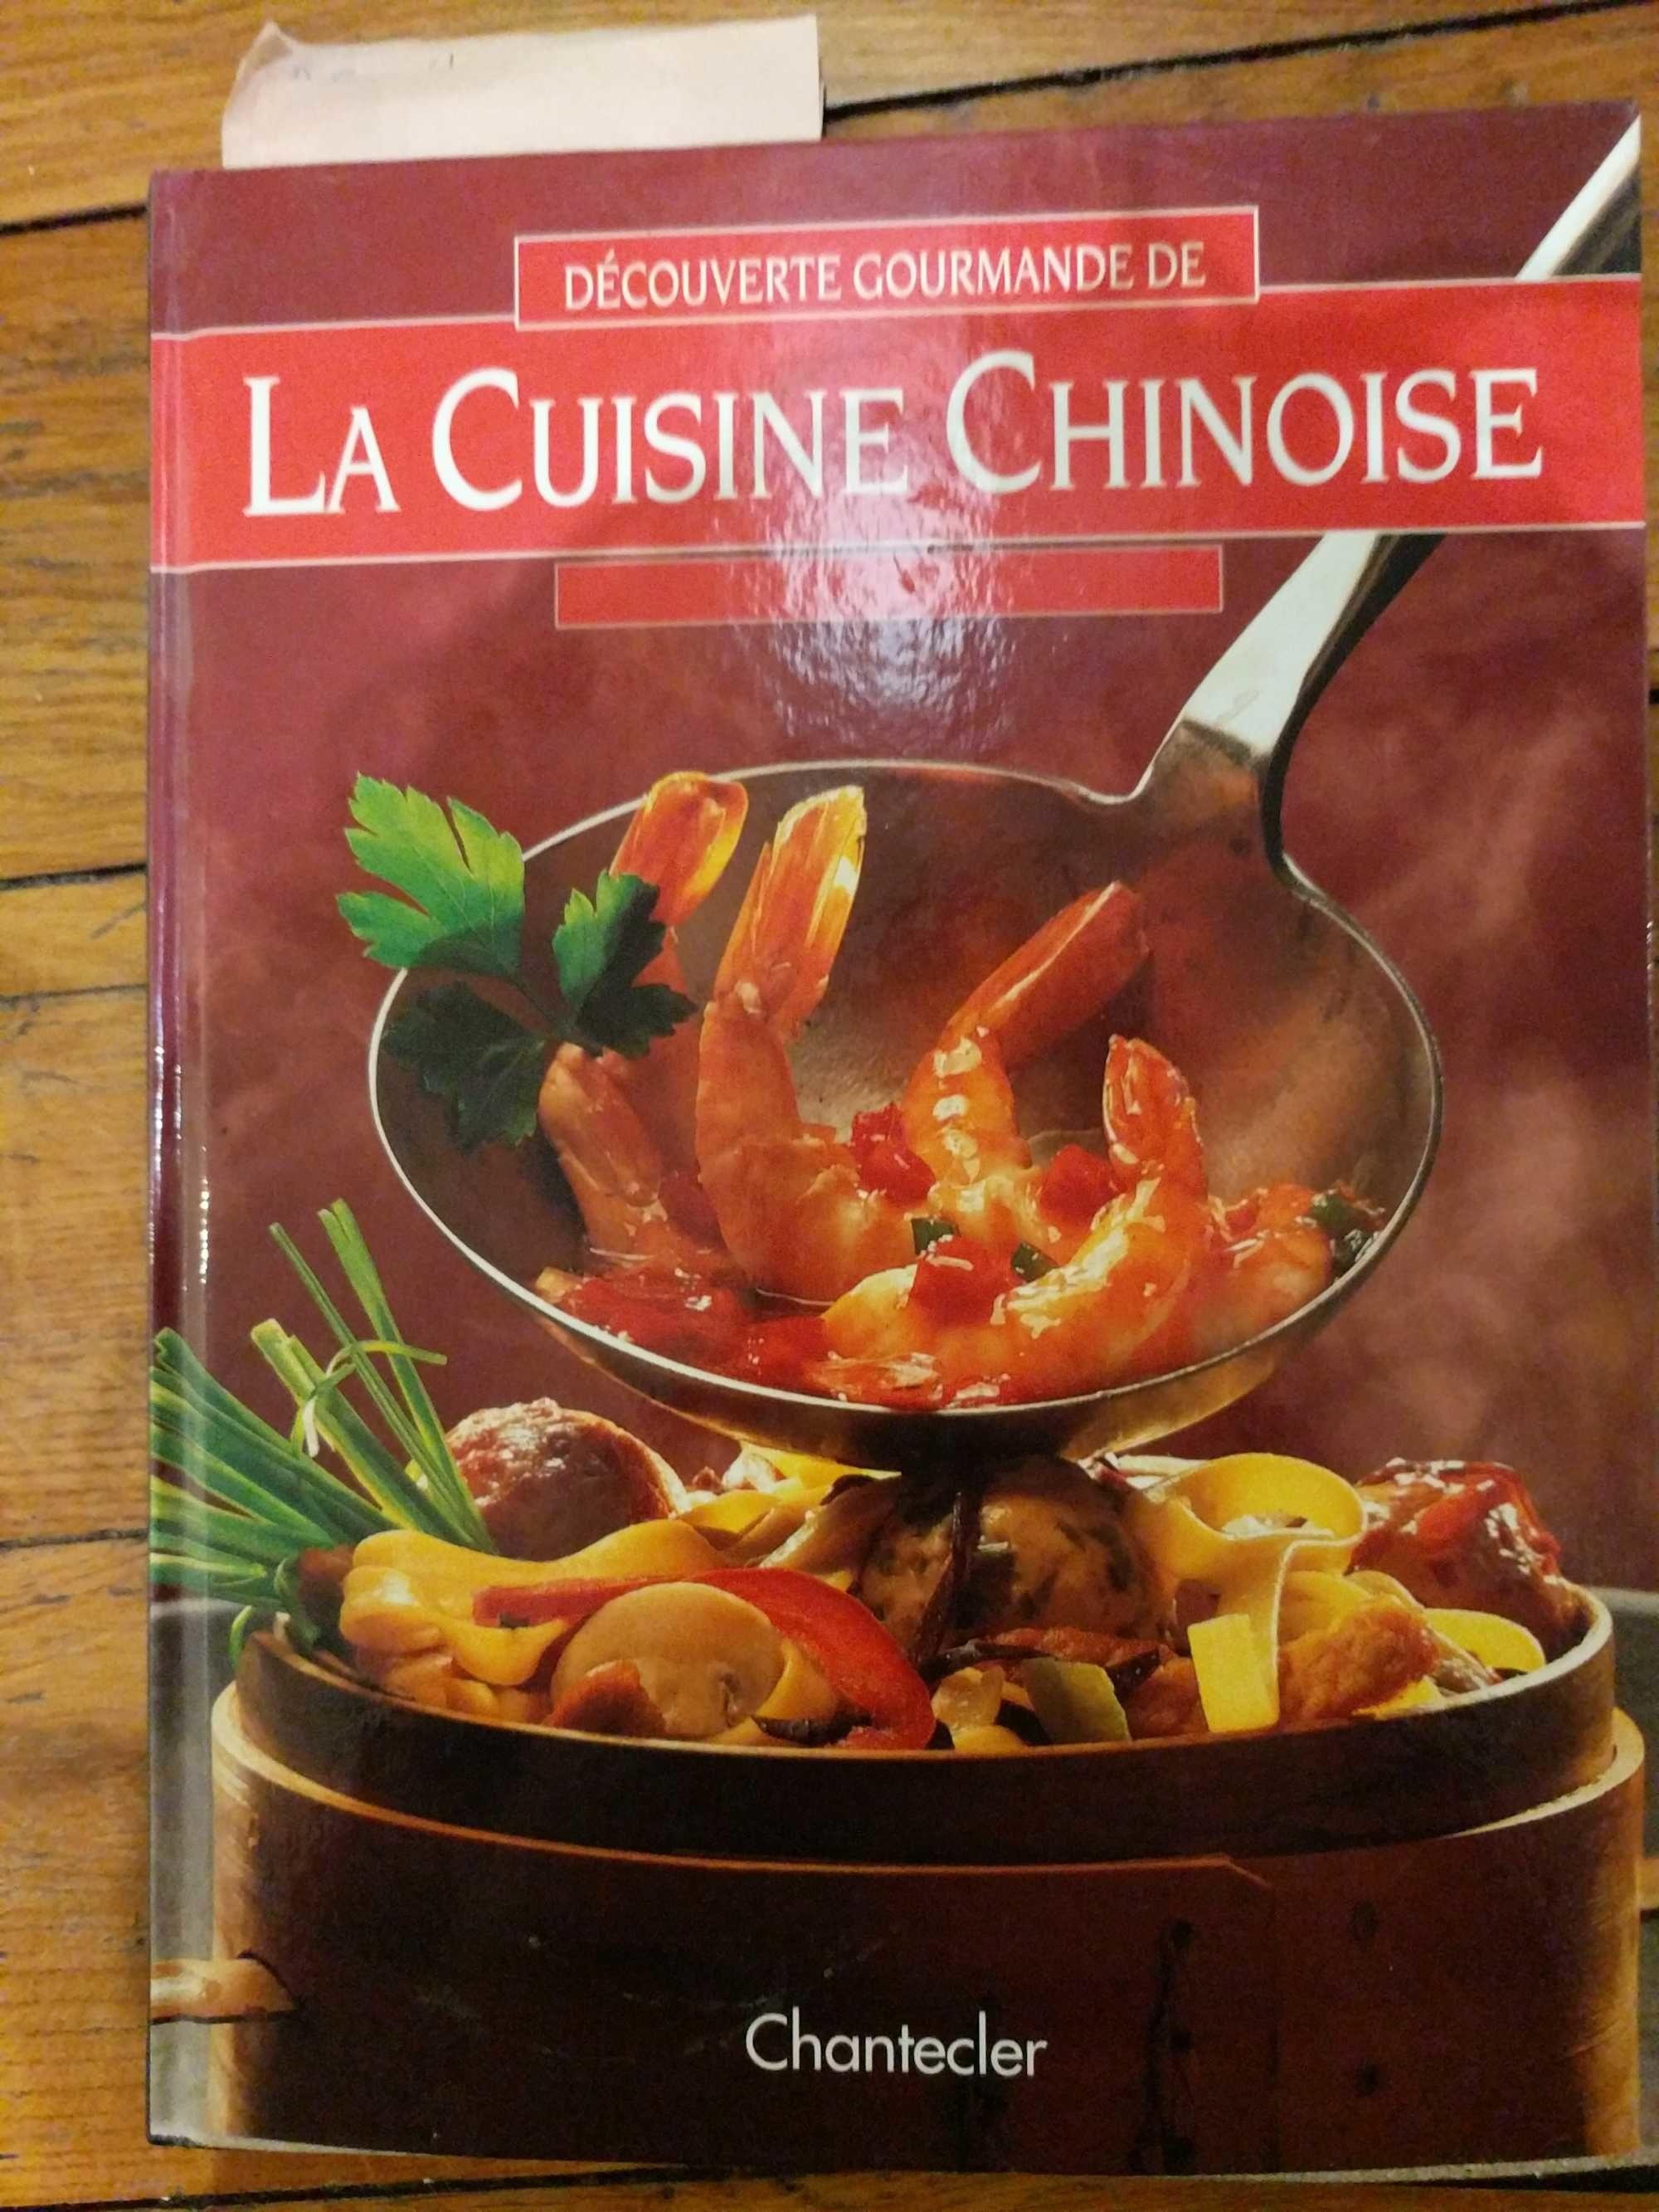 La Cuisine Chinoise - Product - fr